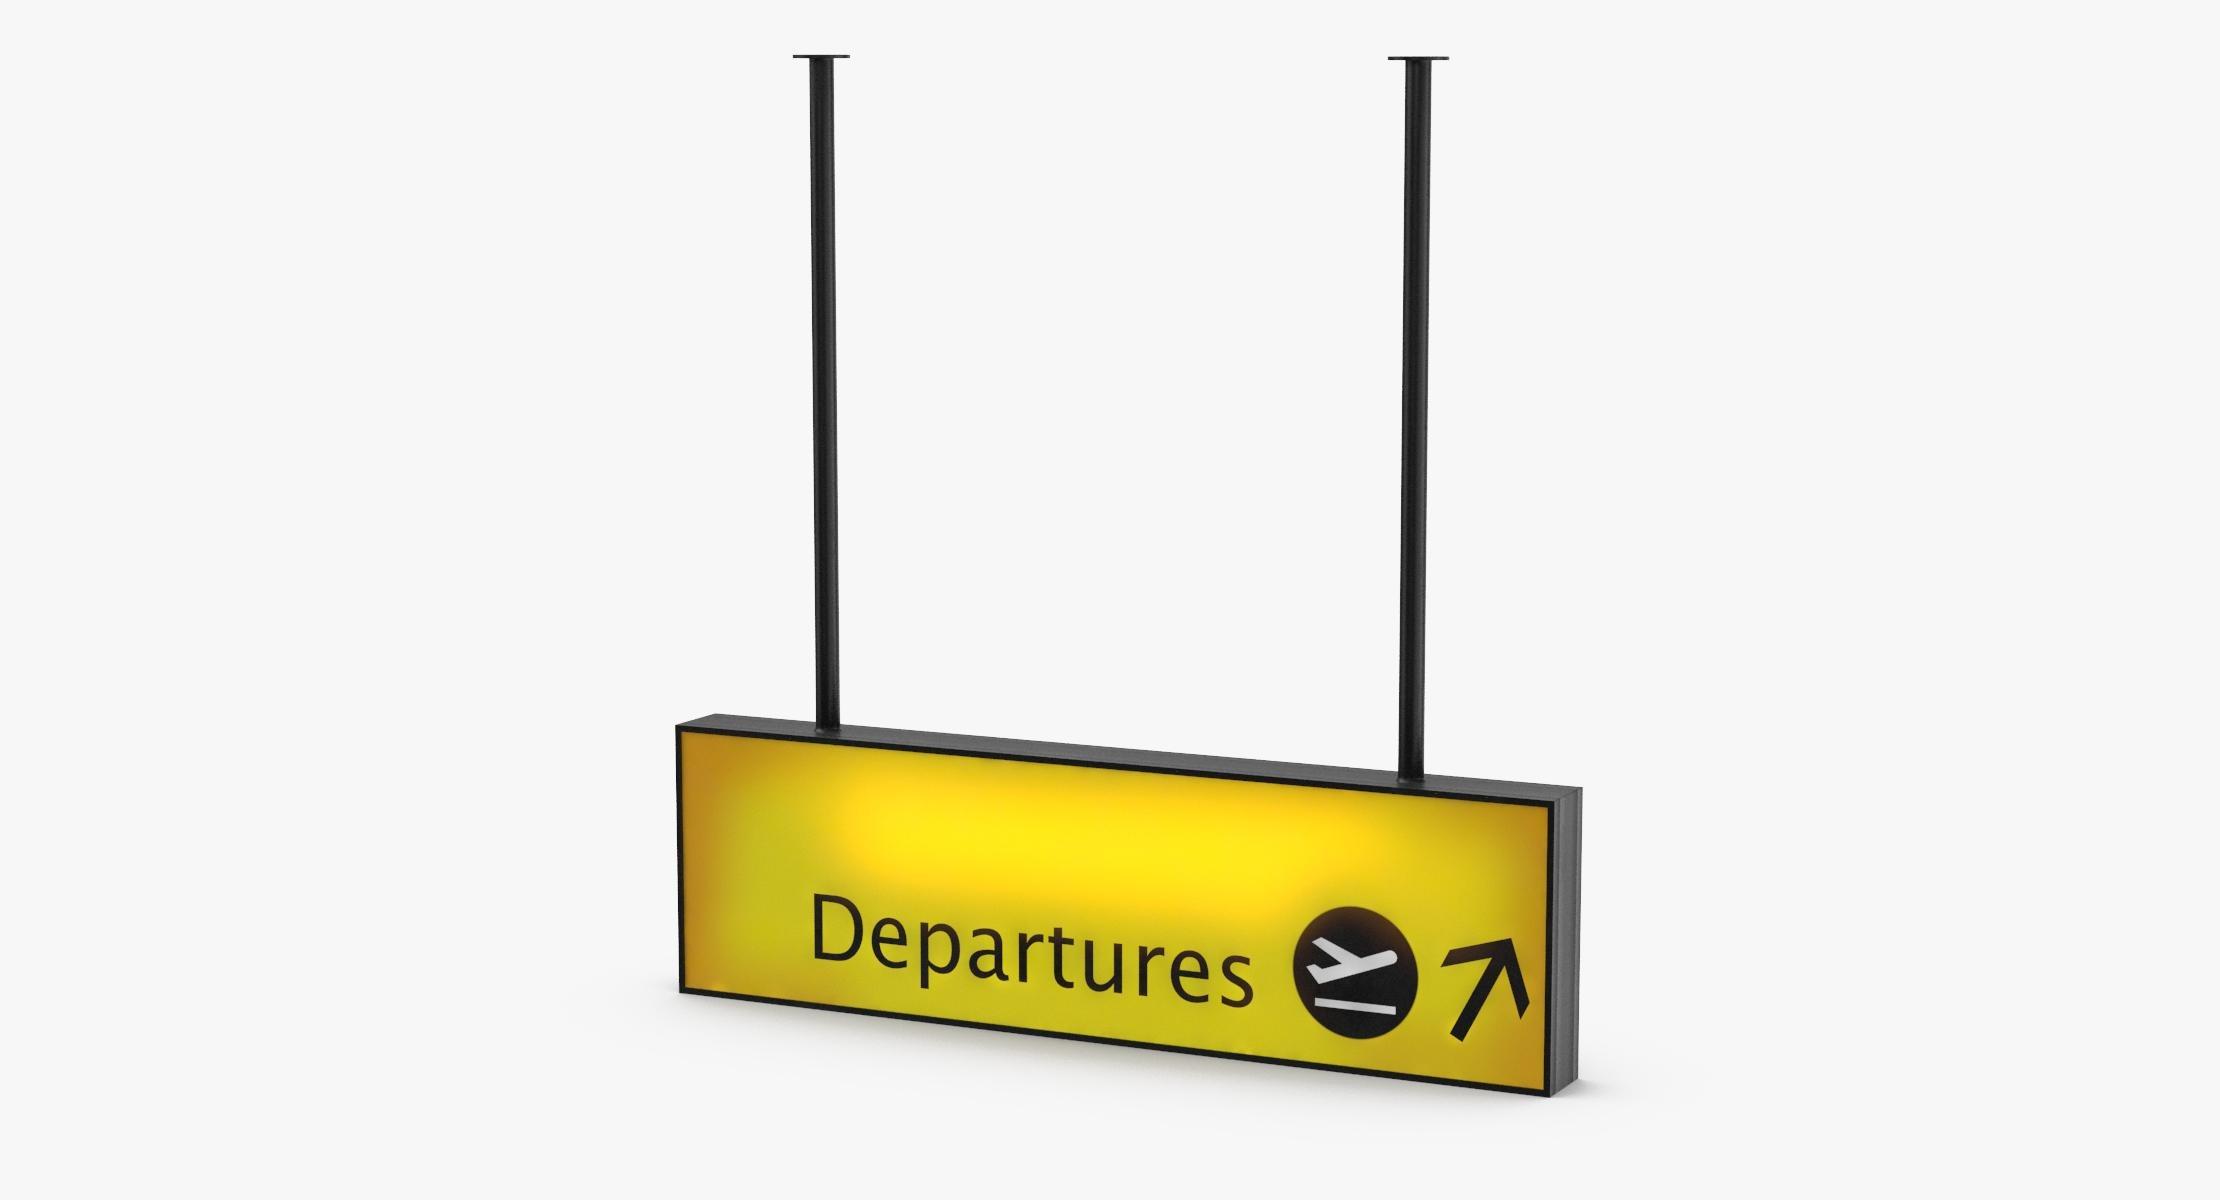 Airport Departure Sign 01 - reel 1